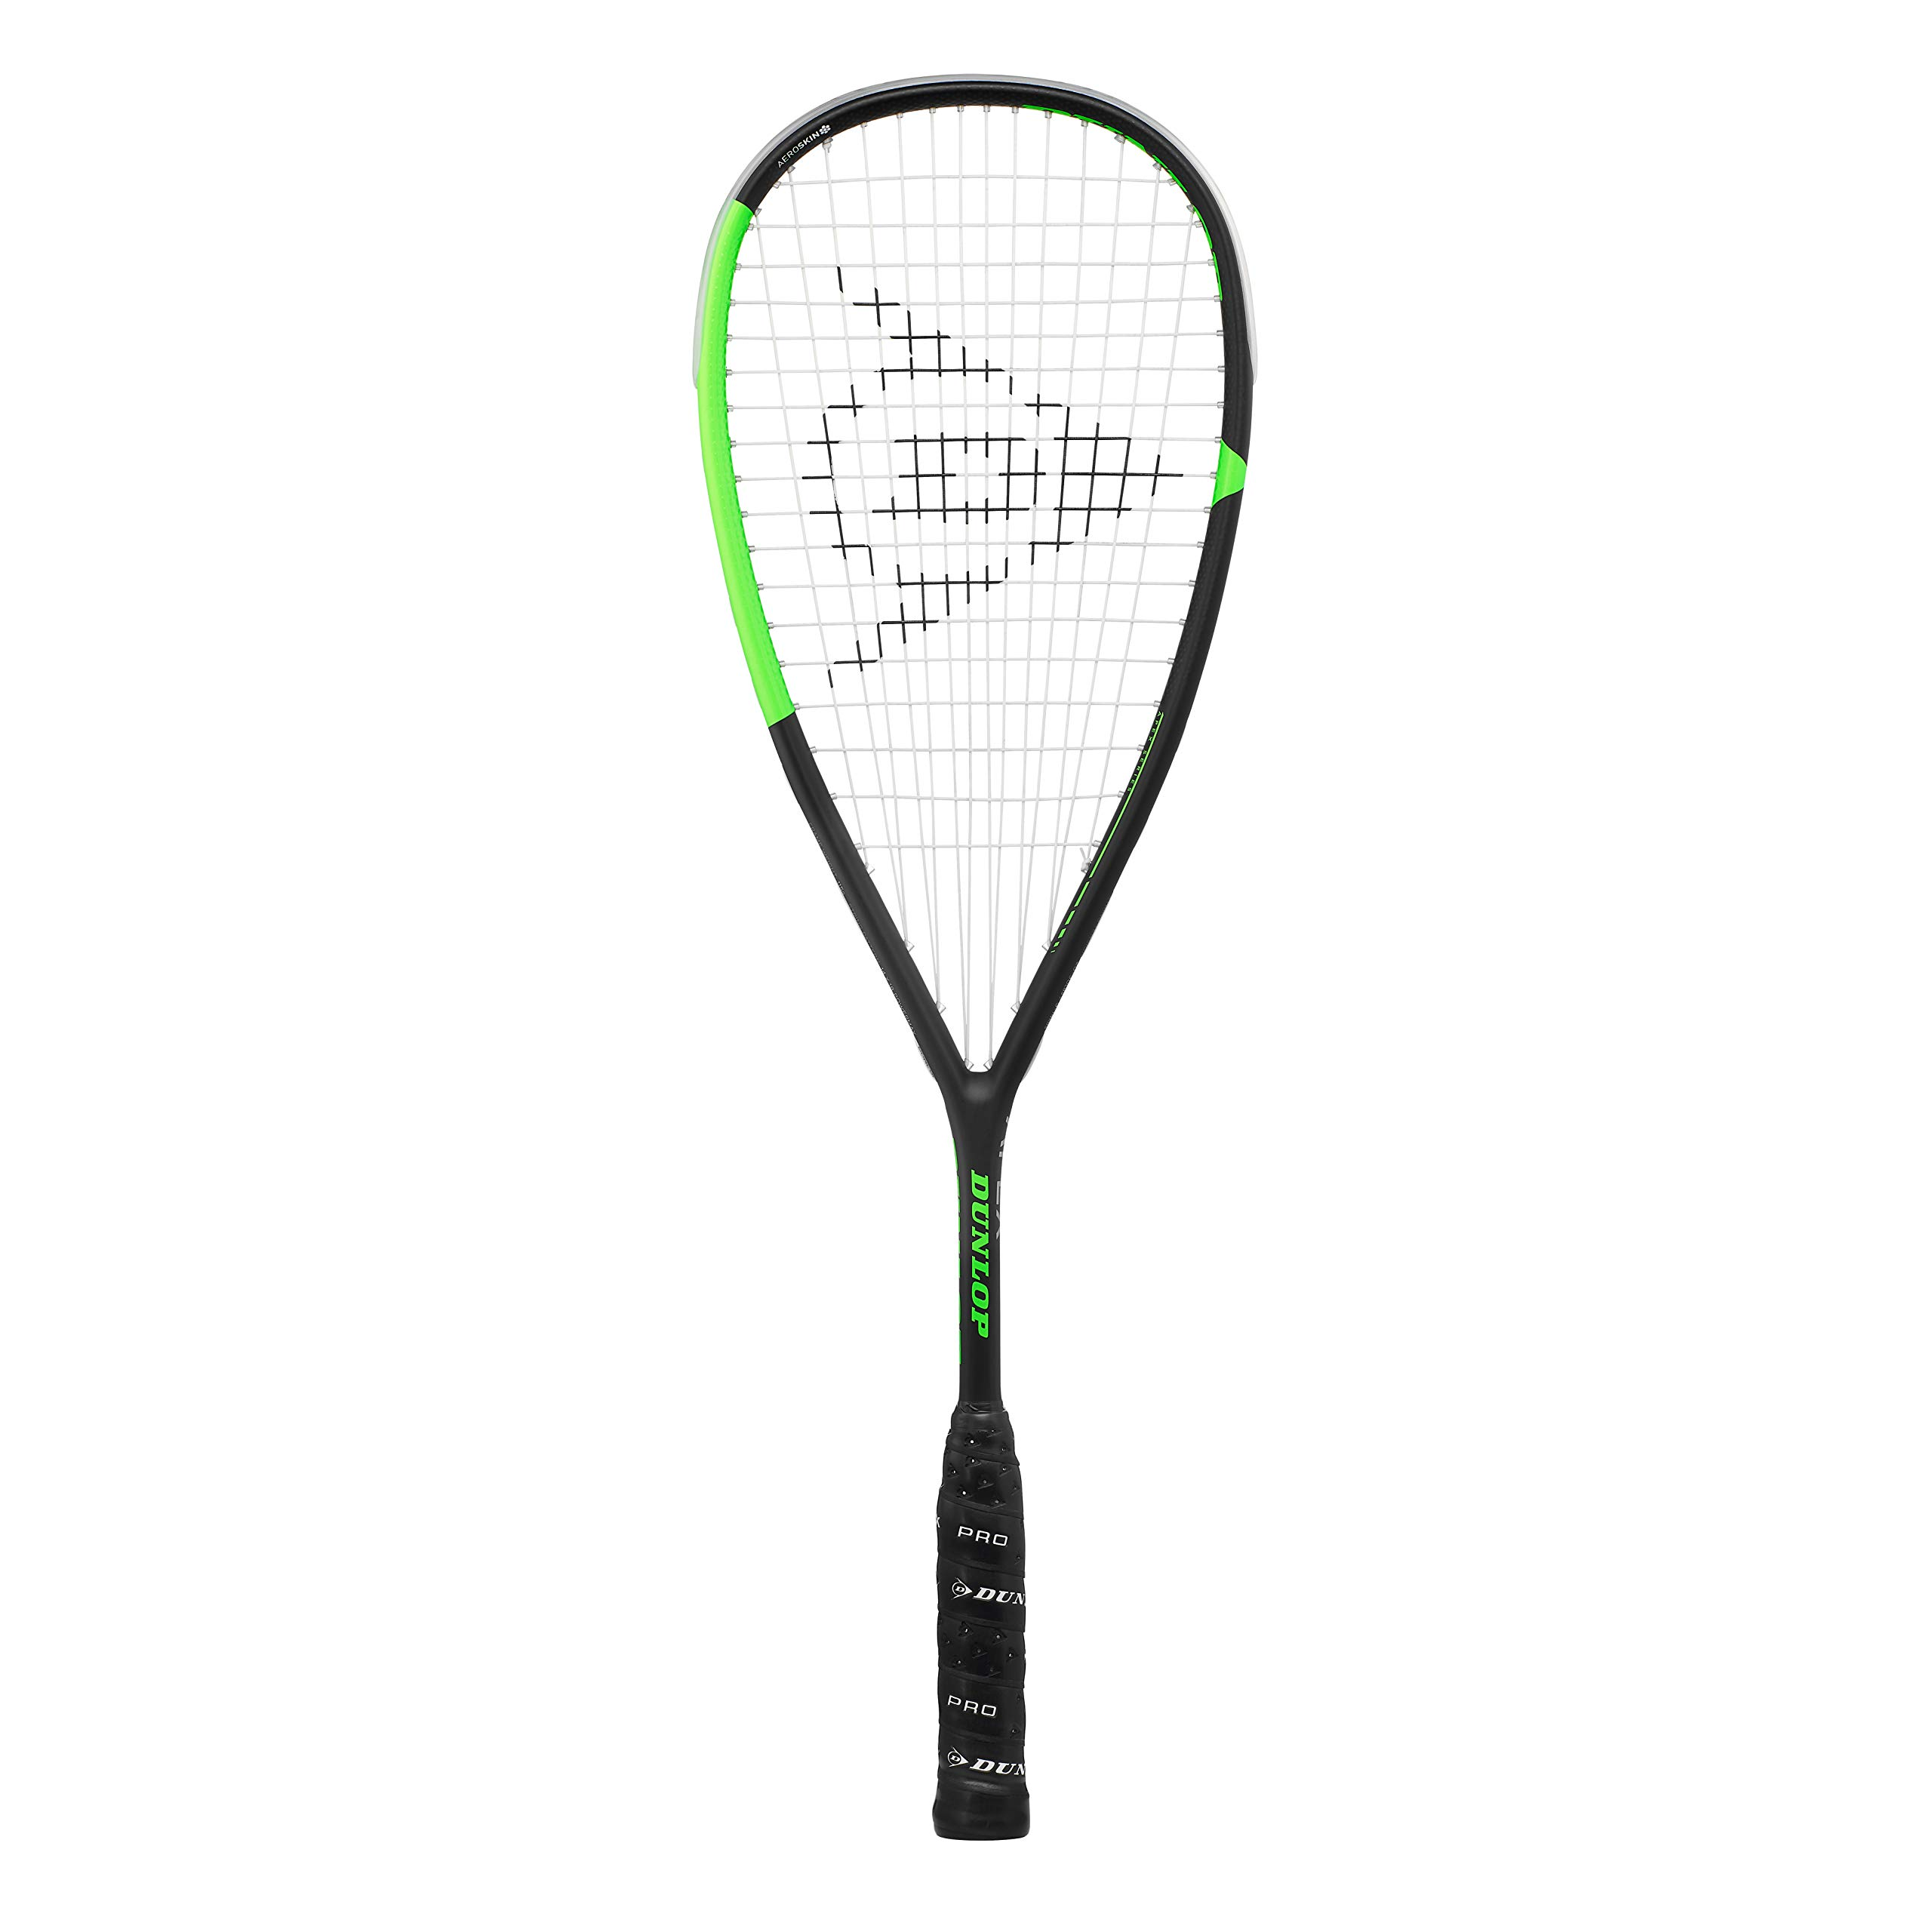 DUNLOP Apex Infinity 4.0 Squash Racquet